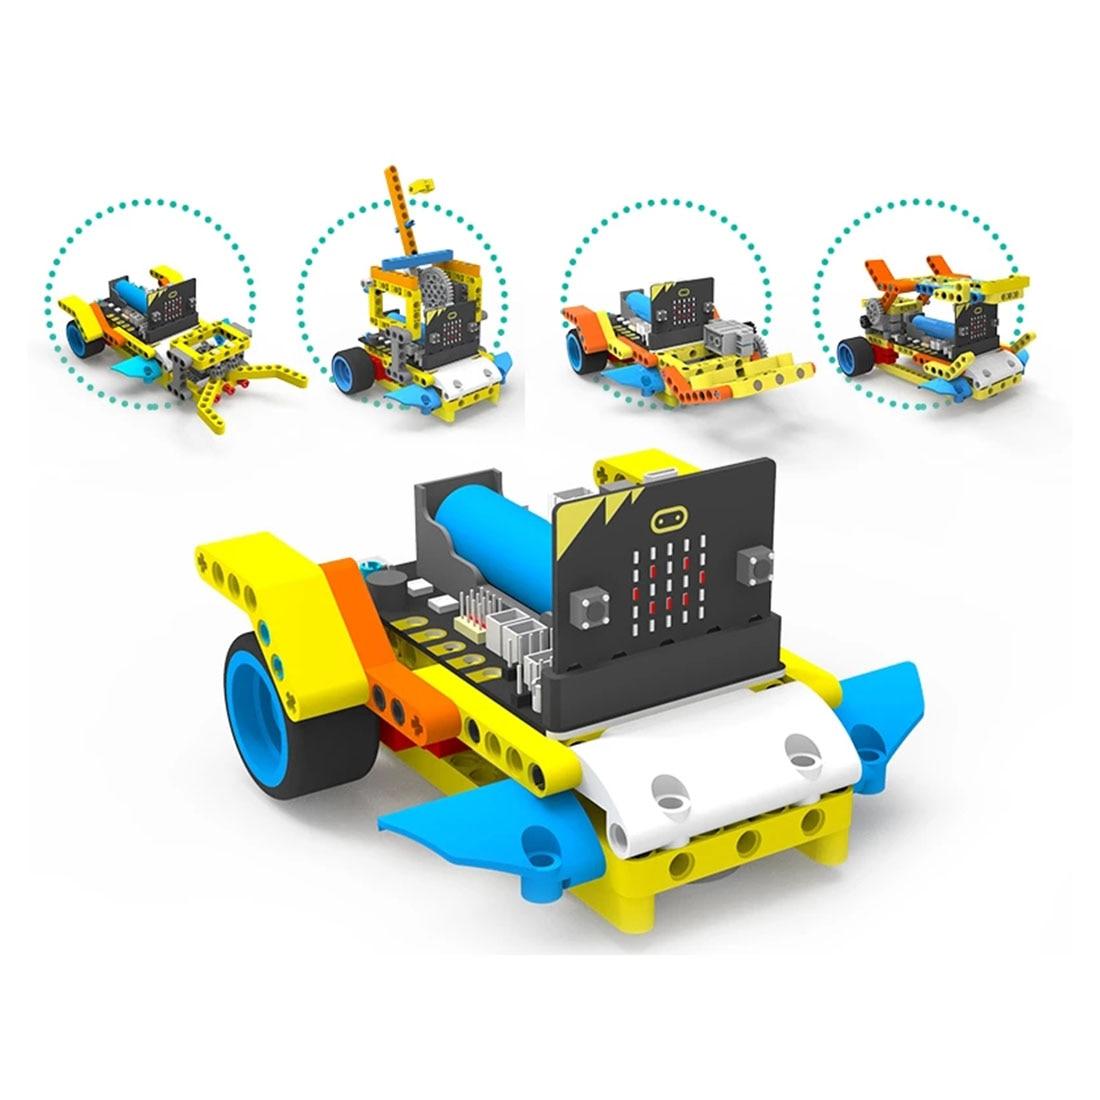 Program Intelligent Robot Building Block Car Kit Shape Programming Education Car For Micro:bit With For Super:bit Expansion